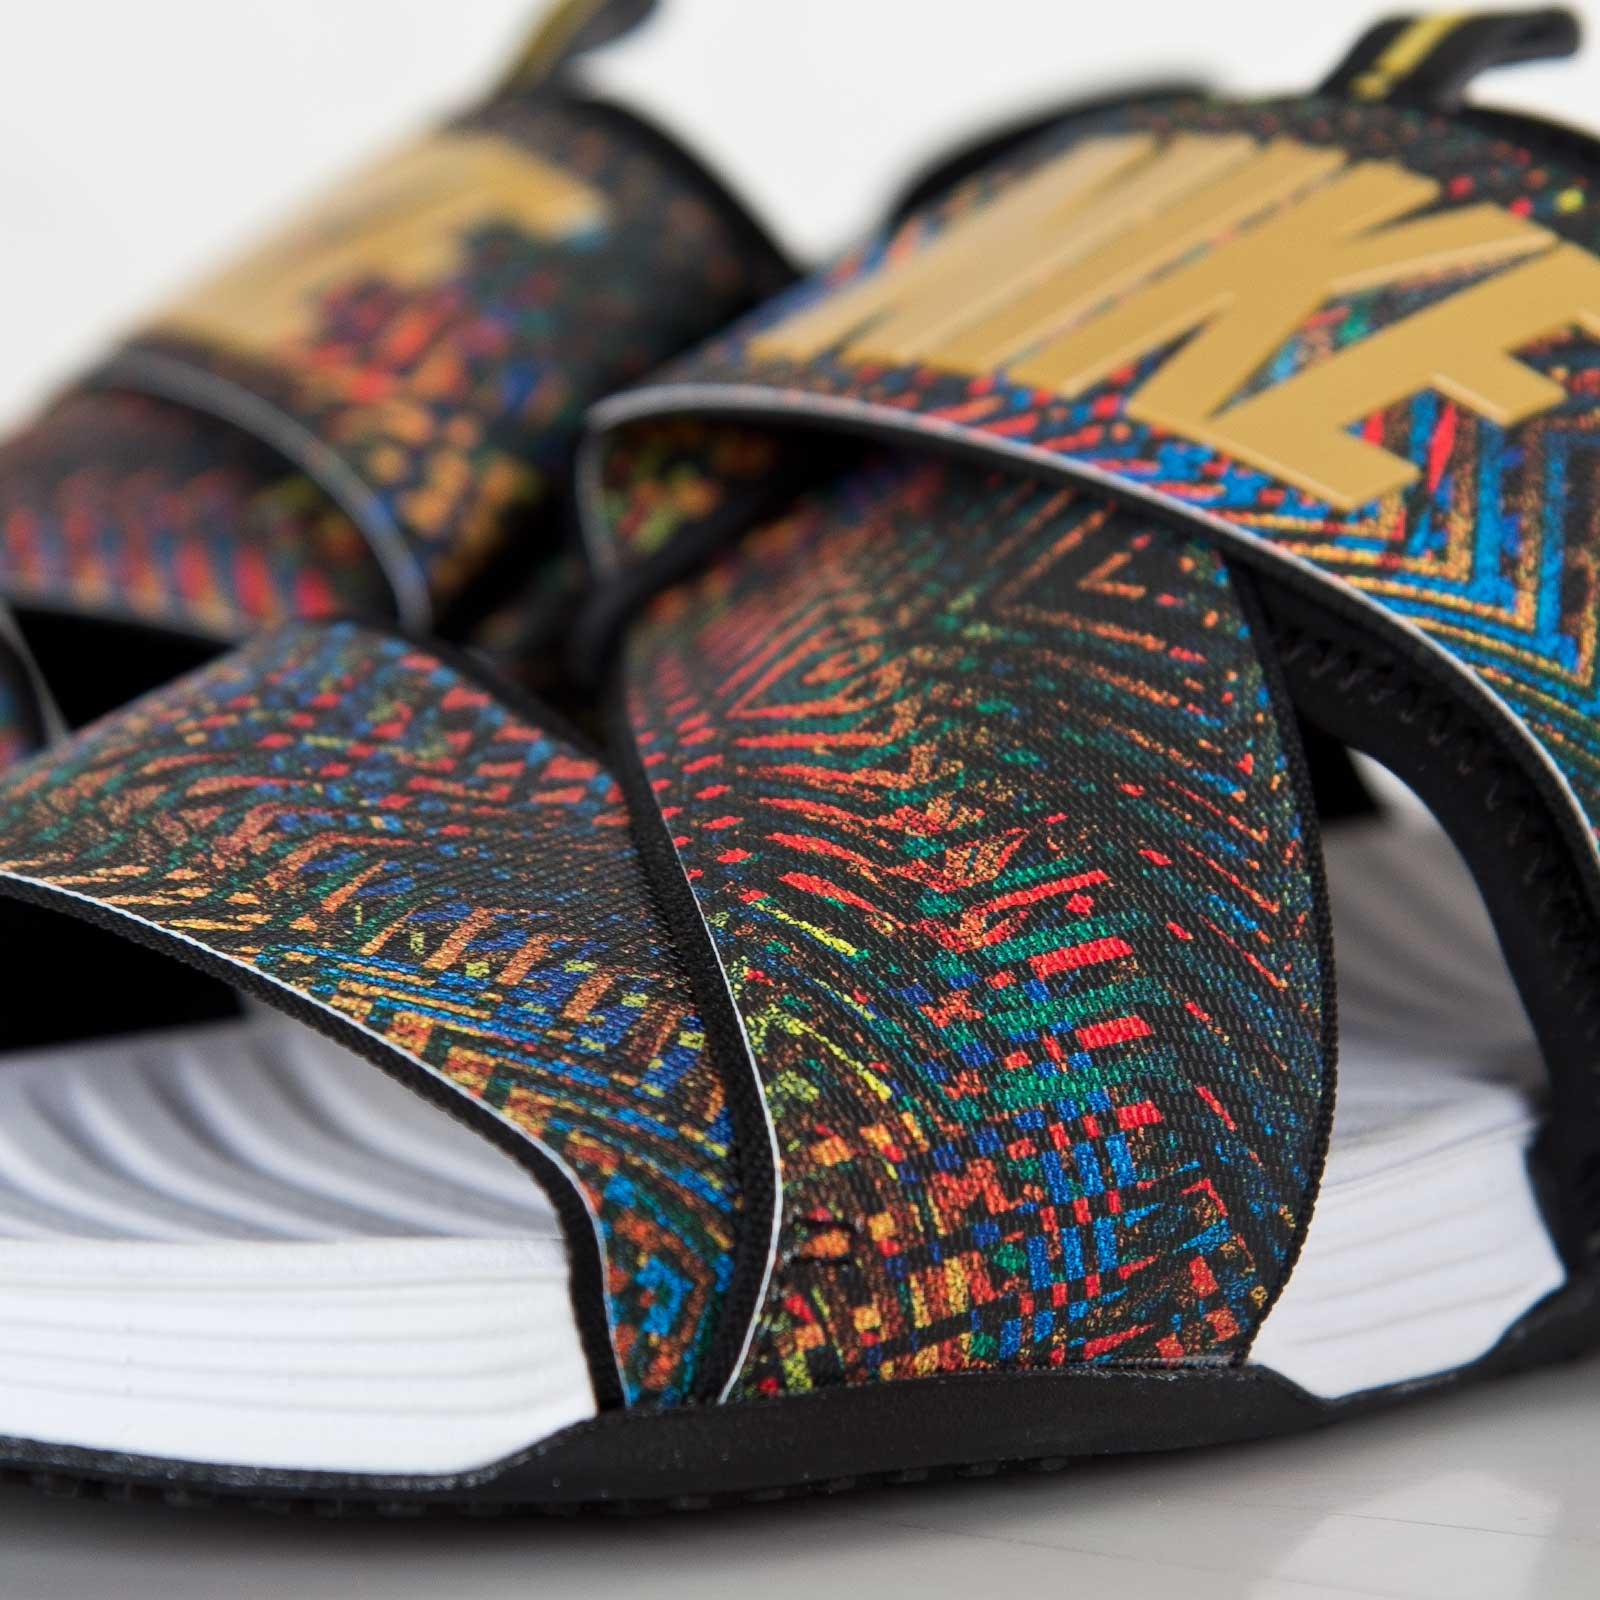 daf2443a293 Nike Air Solarsoft Zigzag QS - 705536-770 - Sneakersnstuff ...